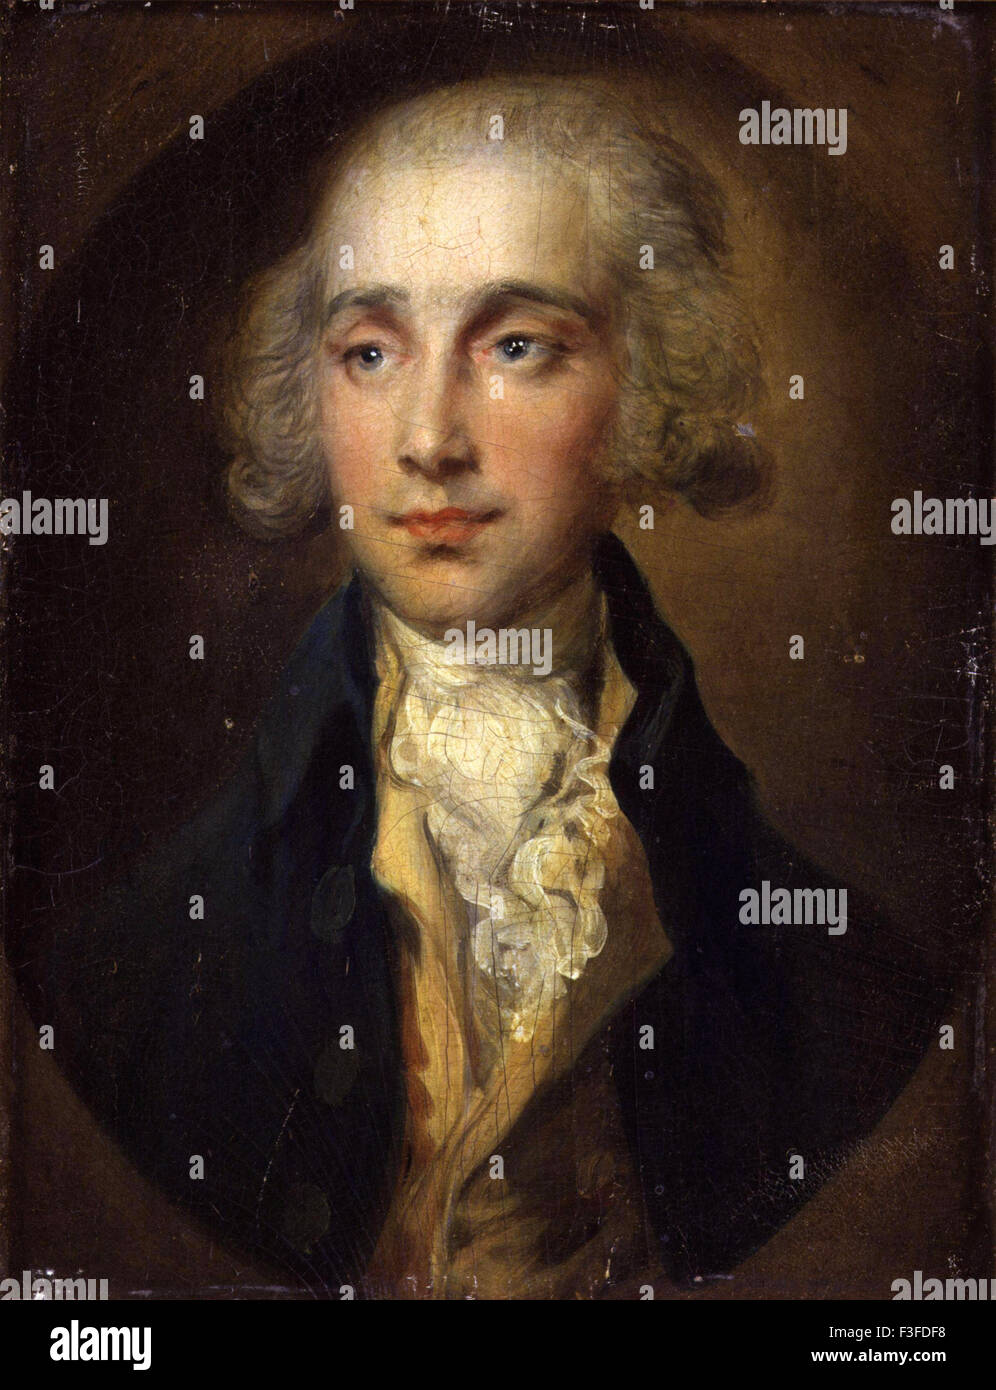 Thomas Gainsboroug - James Maitland, 8th Earl of Lauderdale - Stock Image